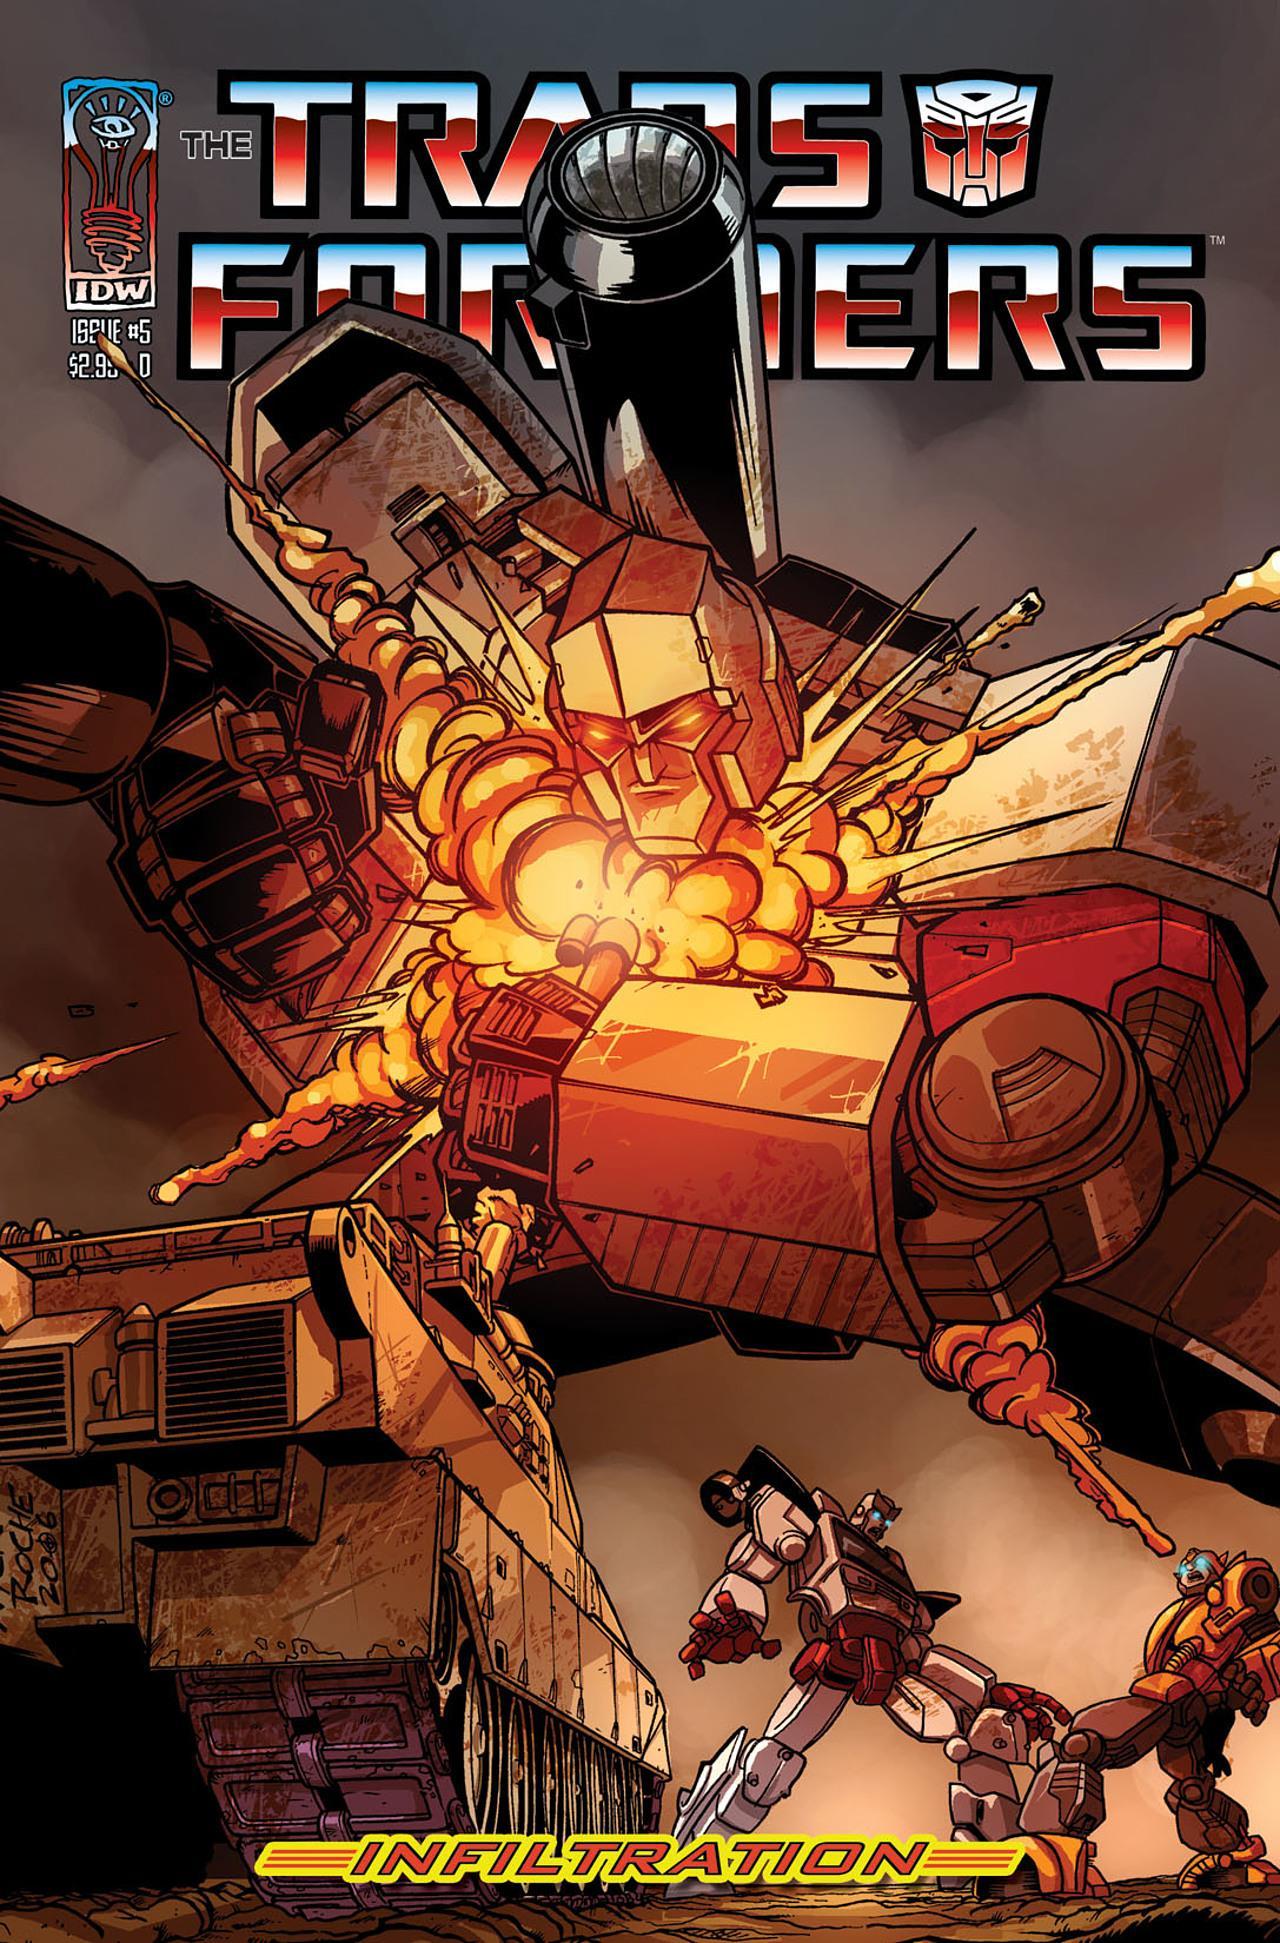 Cover D: Nick Roche